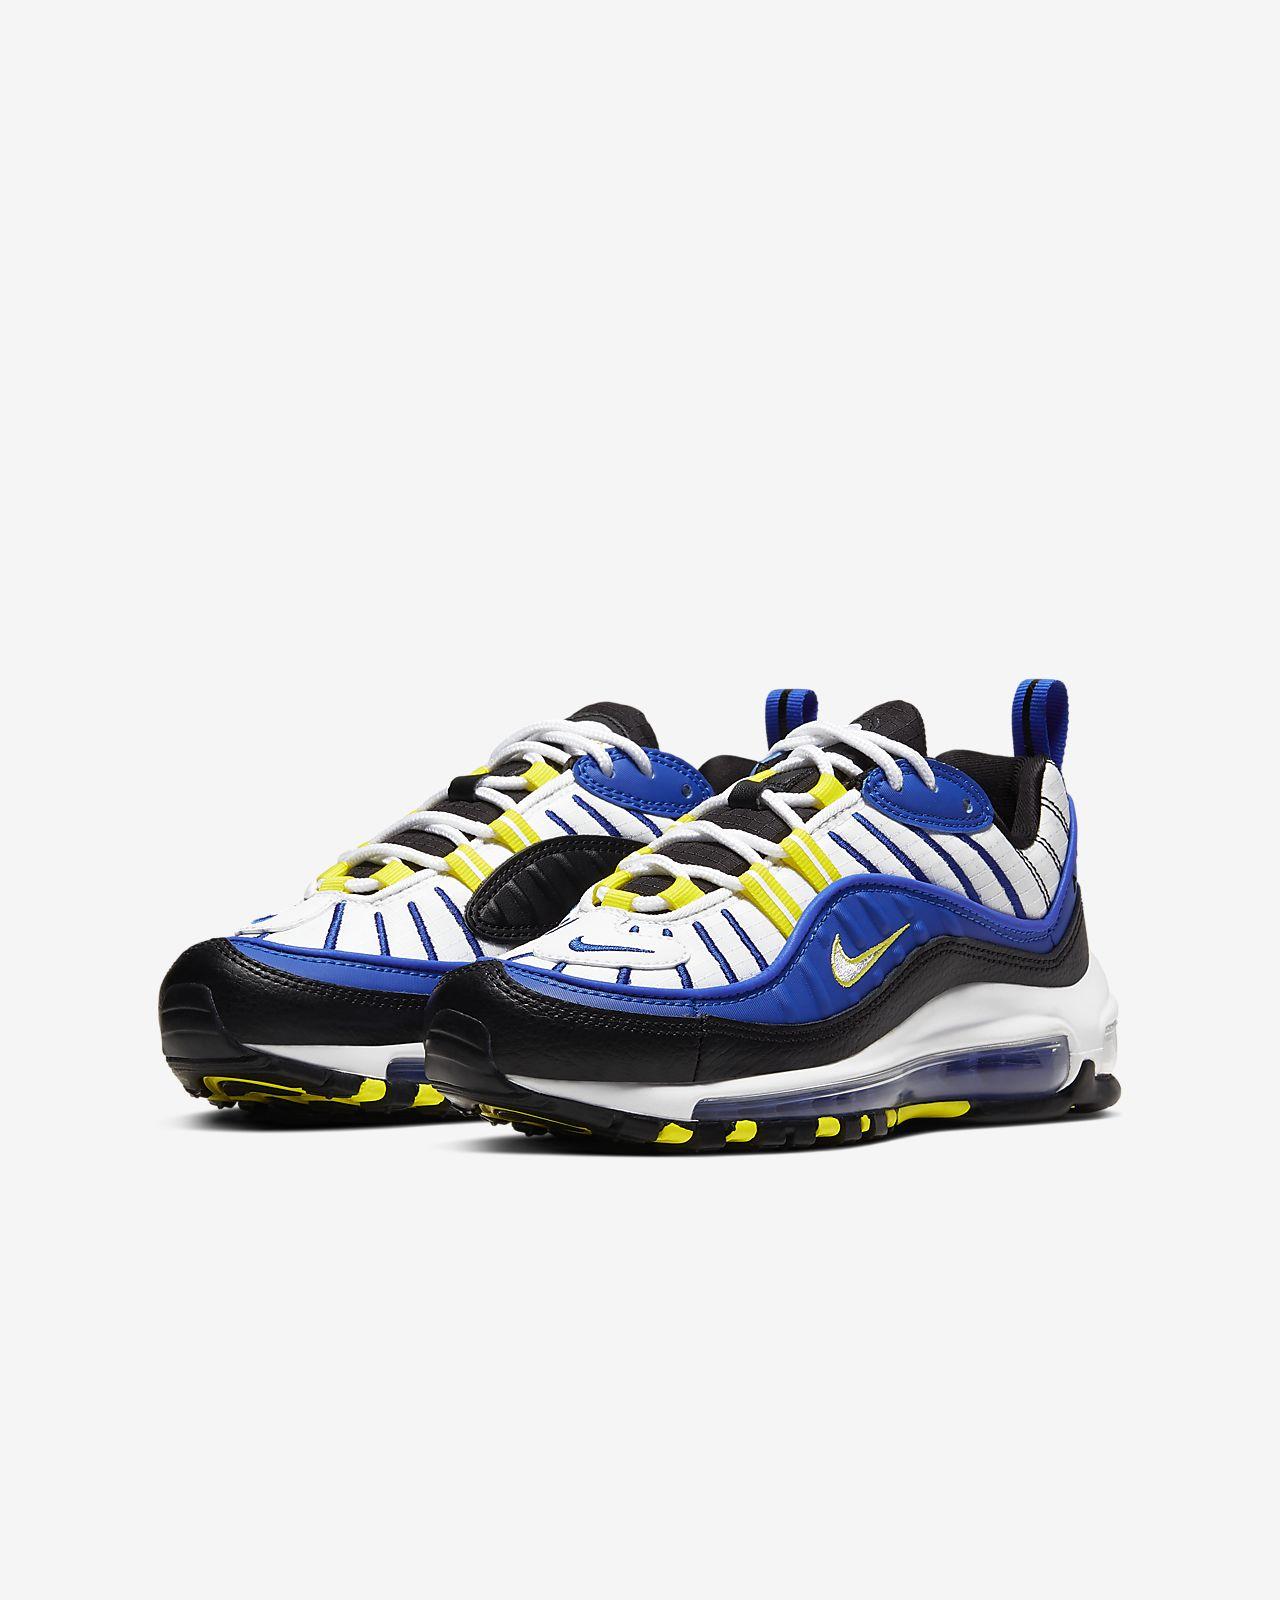 air max 98 racer blue yellow